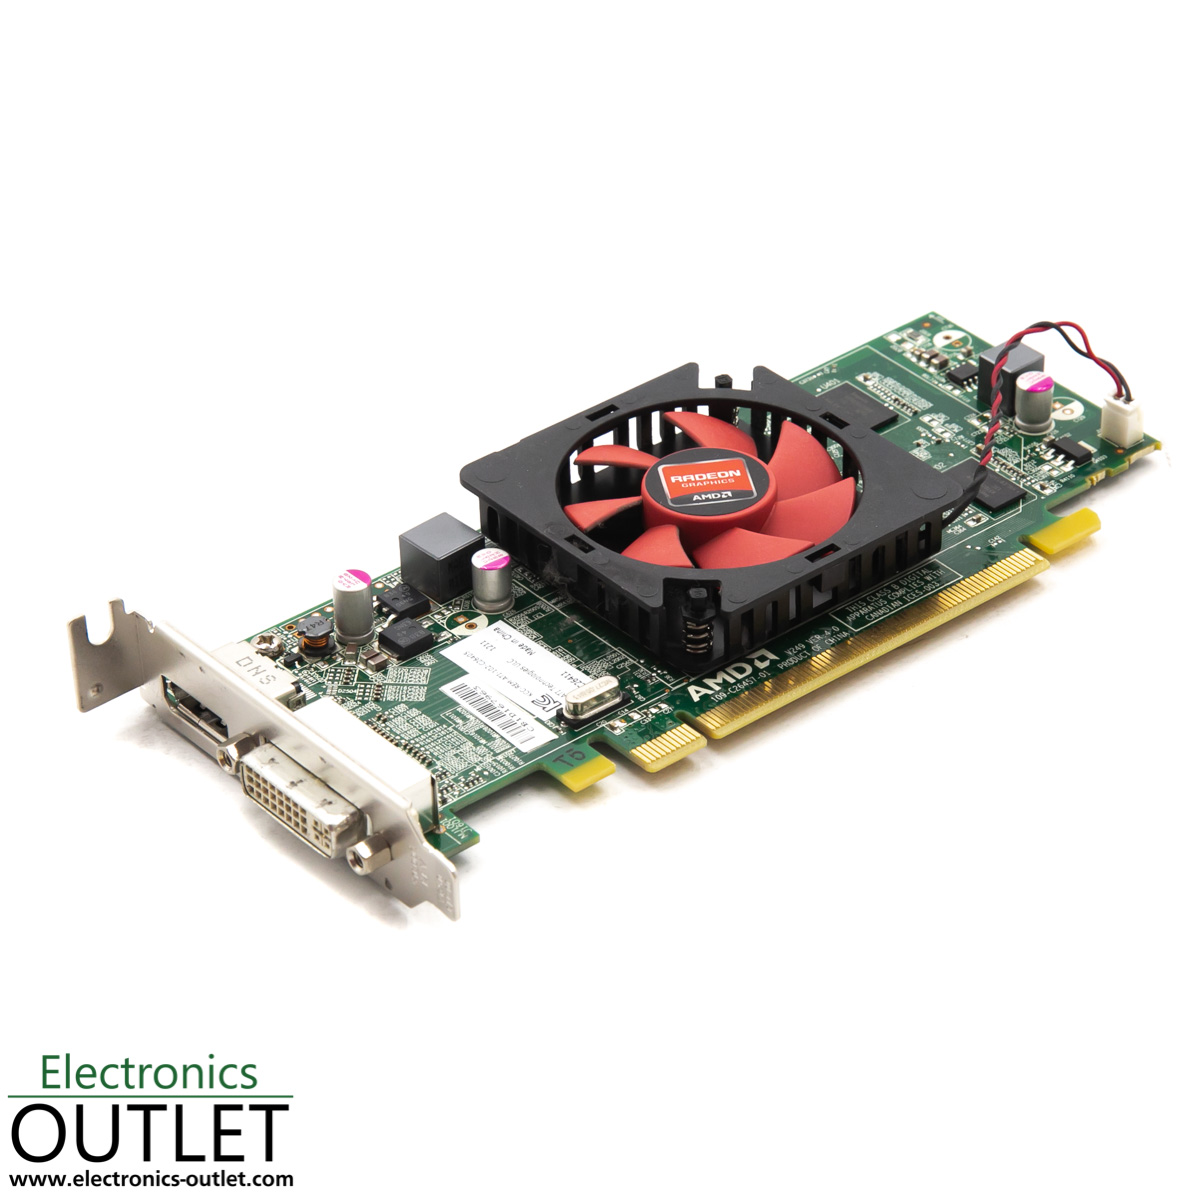 Amd Ati Radeon Hd 6450 C264 1gb Ram Pci E X16 Low Profile Dvi Displayport Ebay